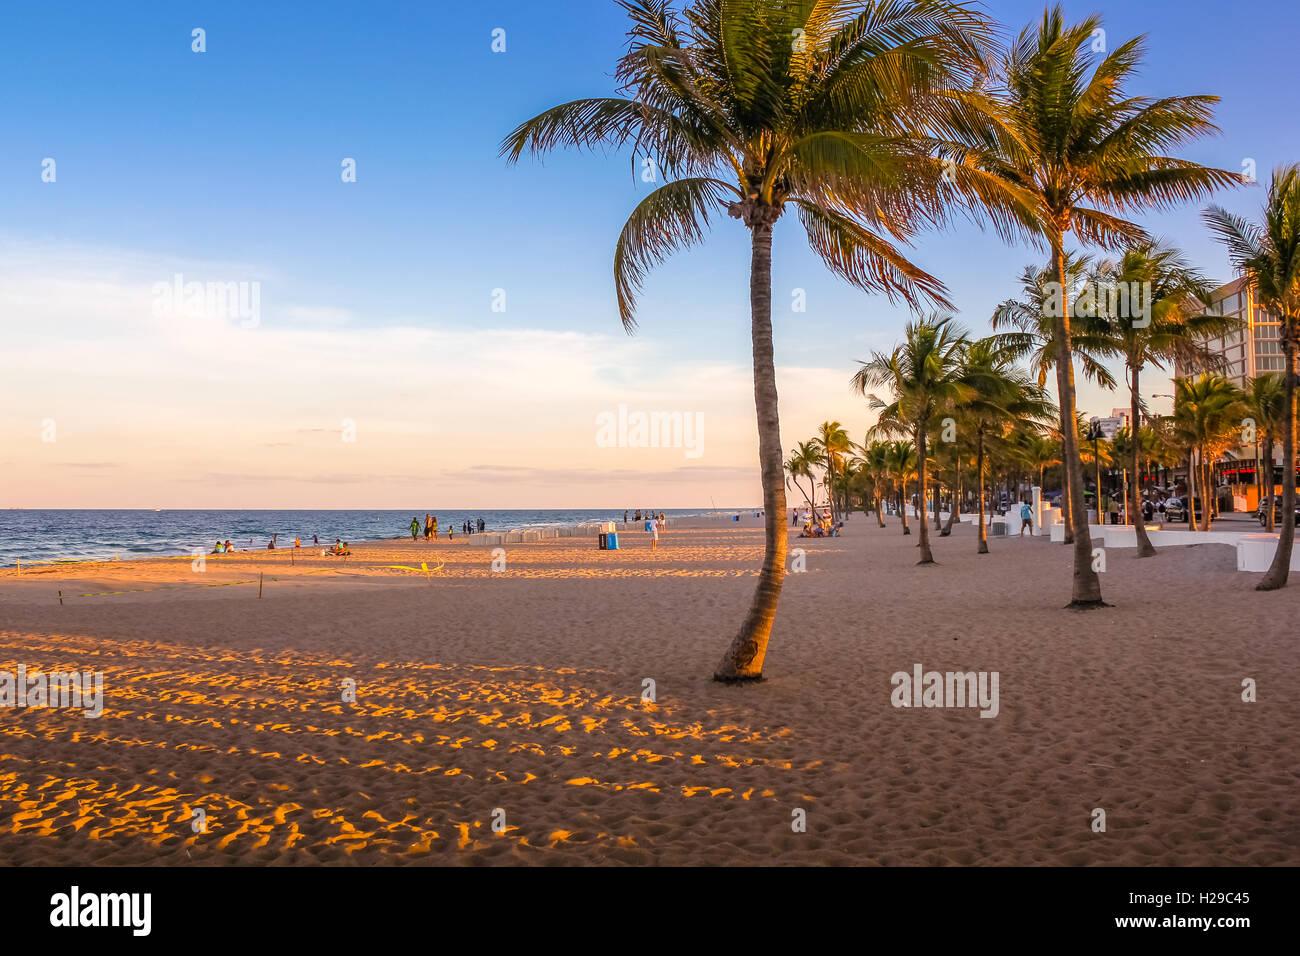 Miami Beach at sunset - Stock Image